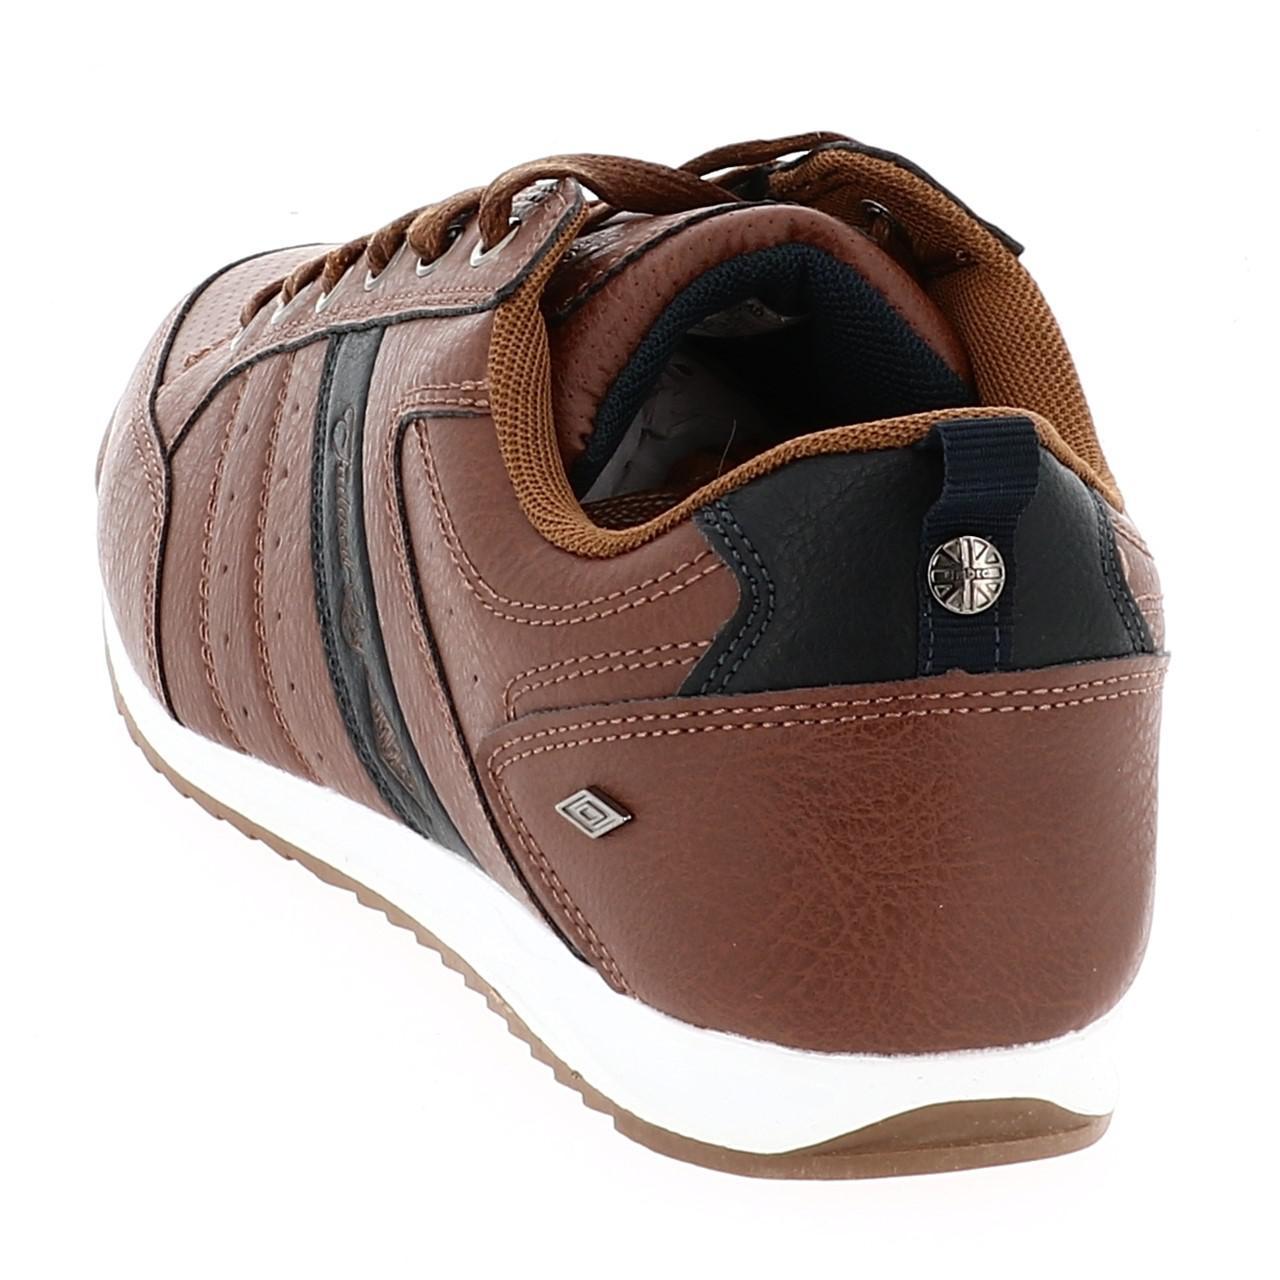 Chaussures-mode-ville-Umbro-Fukky-marron-h-Marron-43759-Neuf